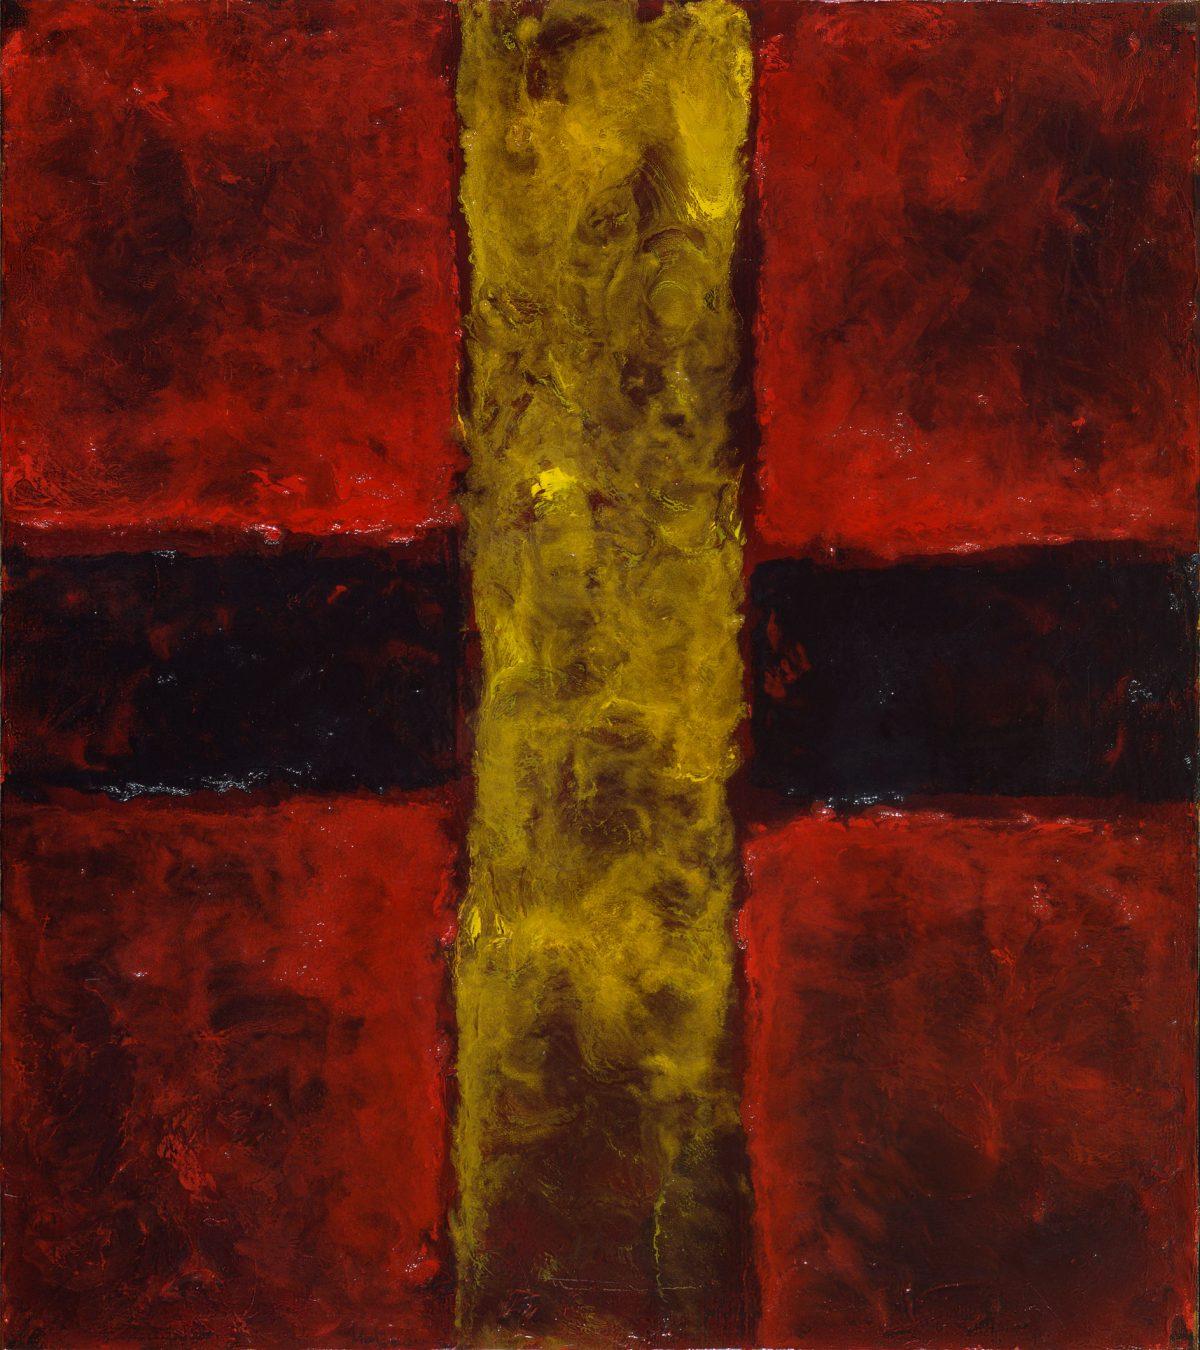 Drapeau inconnu, 1963, Oil on canvas.